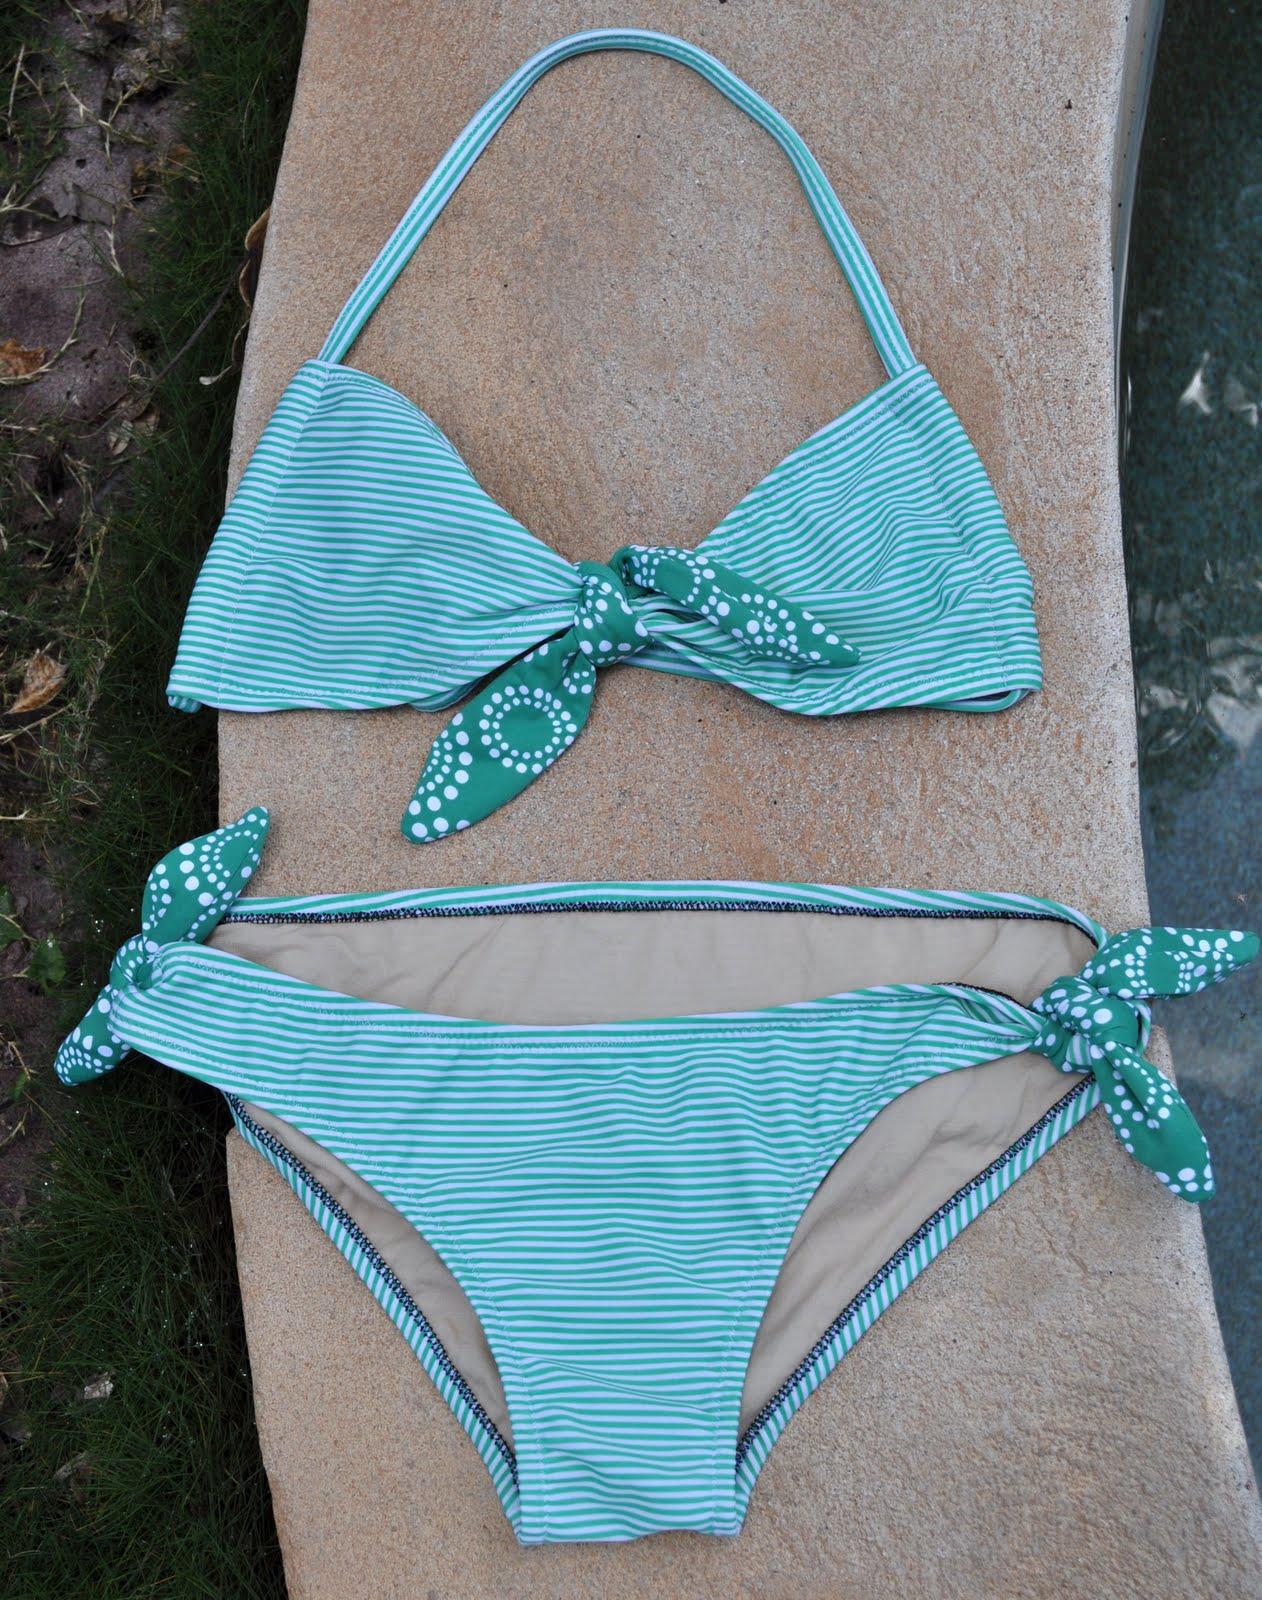 bathing suit pubic hair voyeur bloom s endless summer minty striped